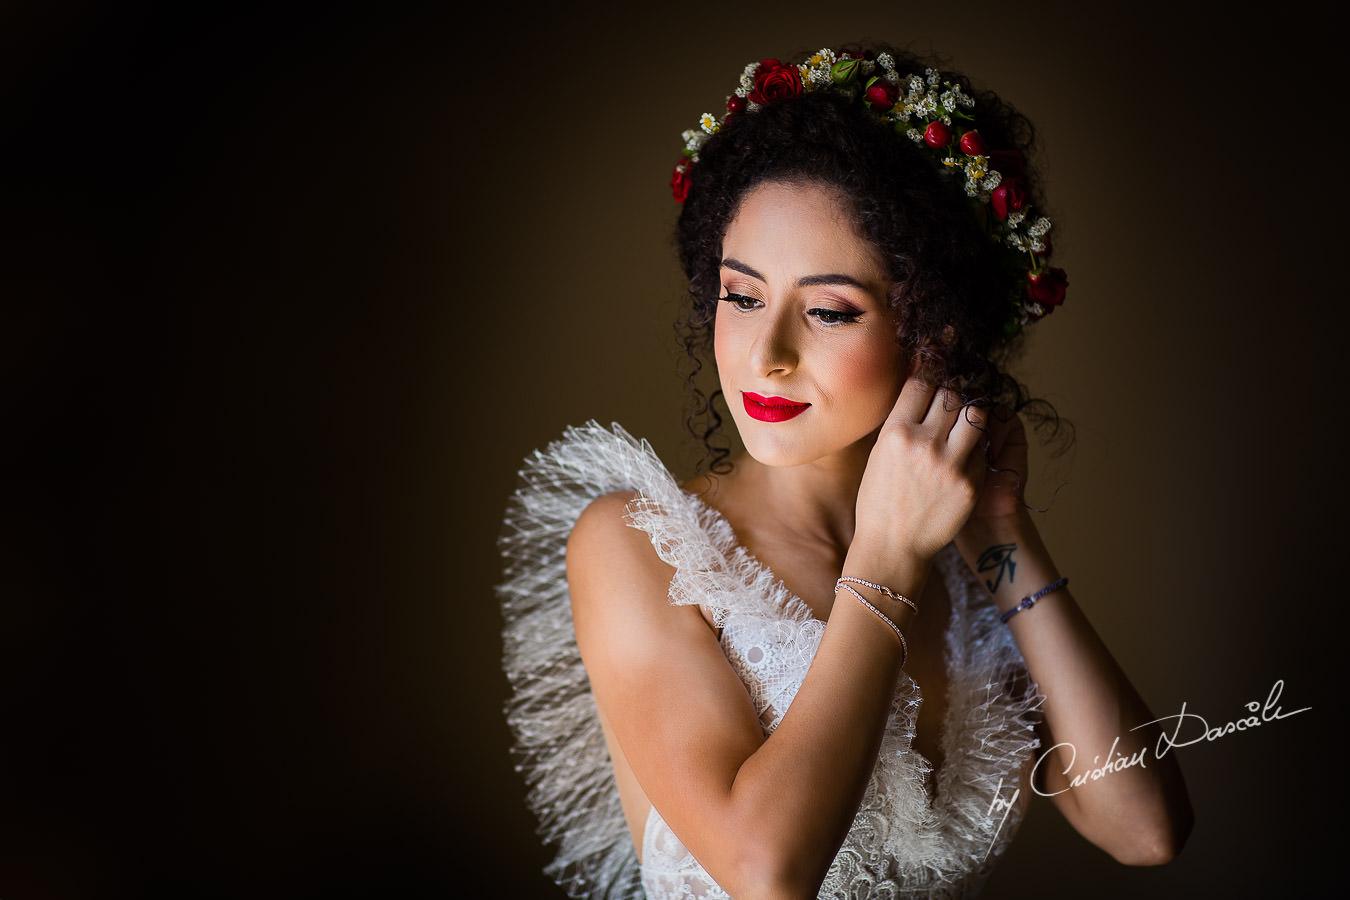 Bridal portrait, captured by Cyprus Wedding Photographer Cristian Dascalu at a beautiful wedding in Larnaka, Cyprus.